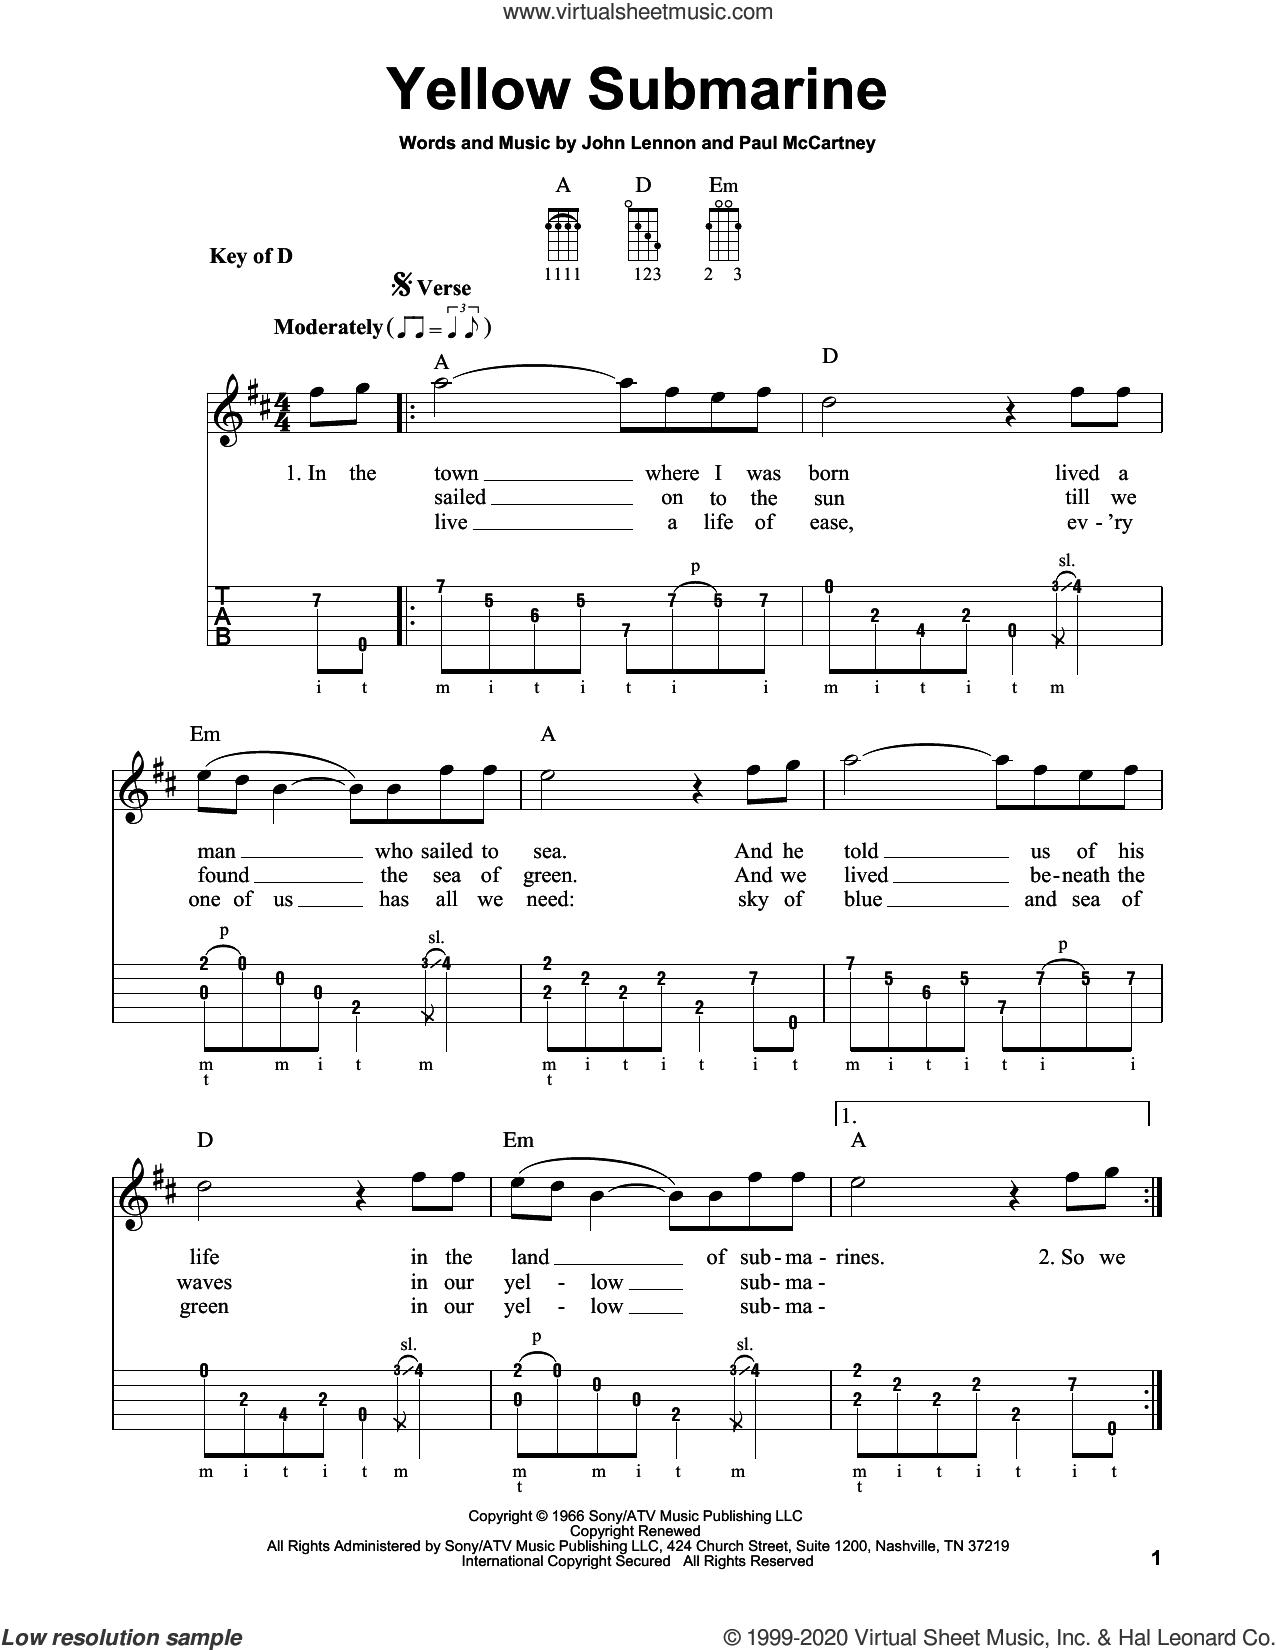 Yellow Submarine sheet music for banjo solo by The Beatles, John Lennon and Paul McCartney, intermediate skill level